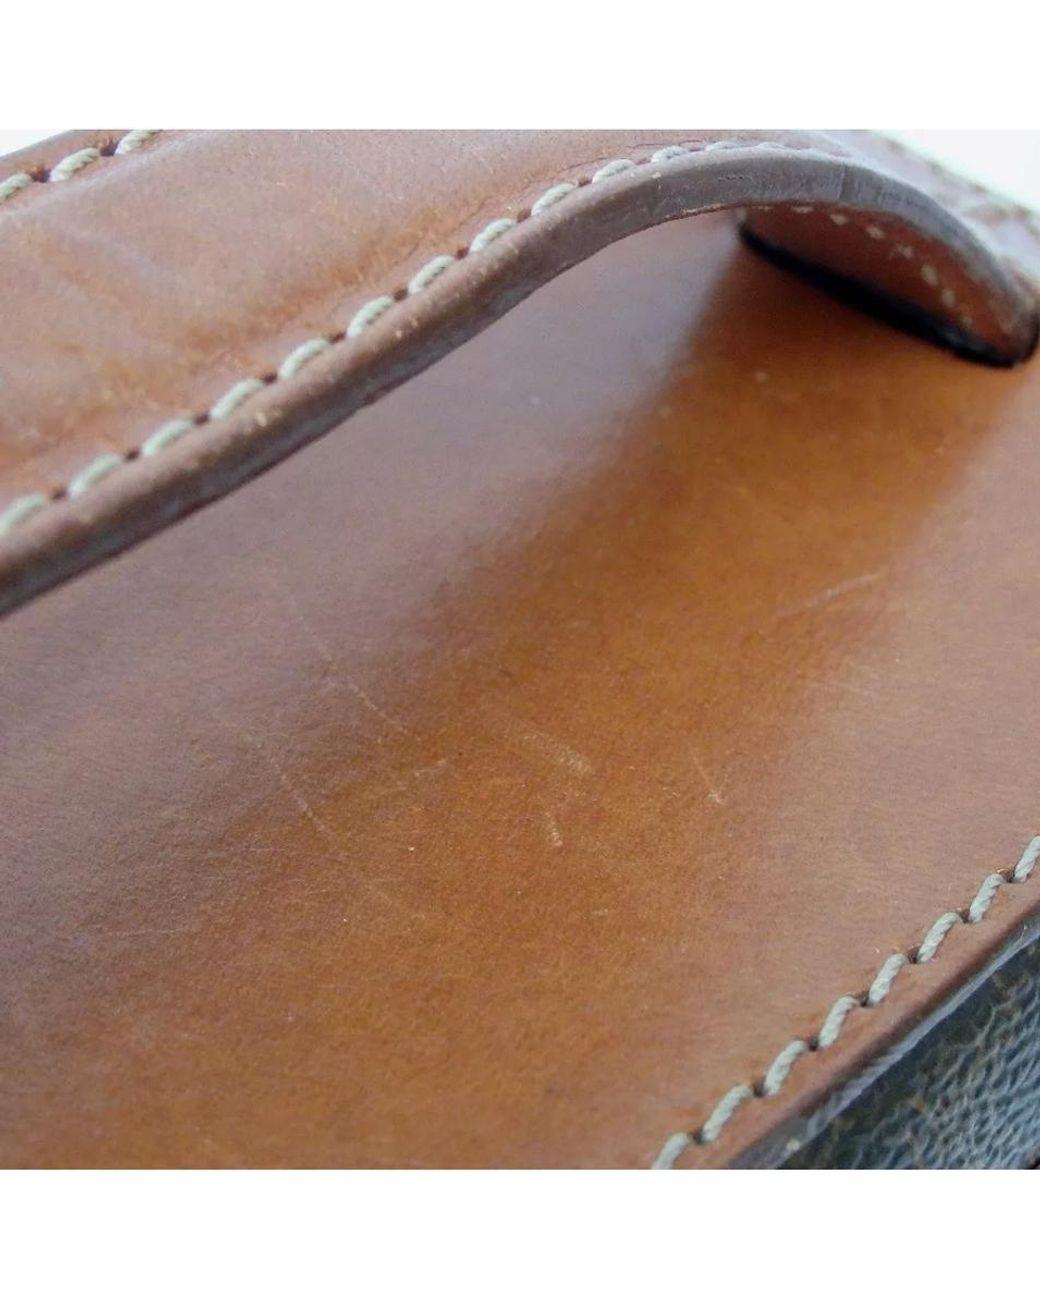 "ETRO Italy Keychain KEY Fob Ring Burgundy Leather Hand Bag Charm 5x3/"" Pouch NEW"